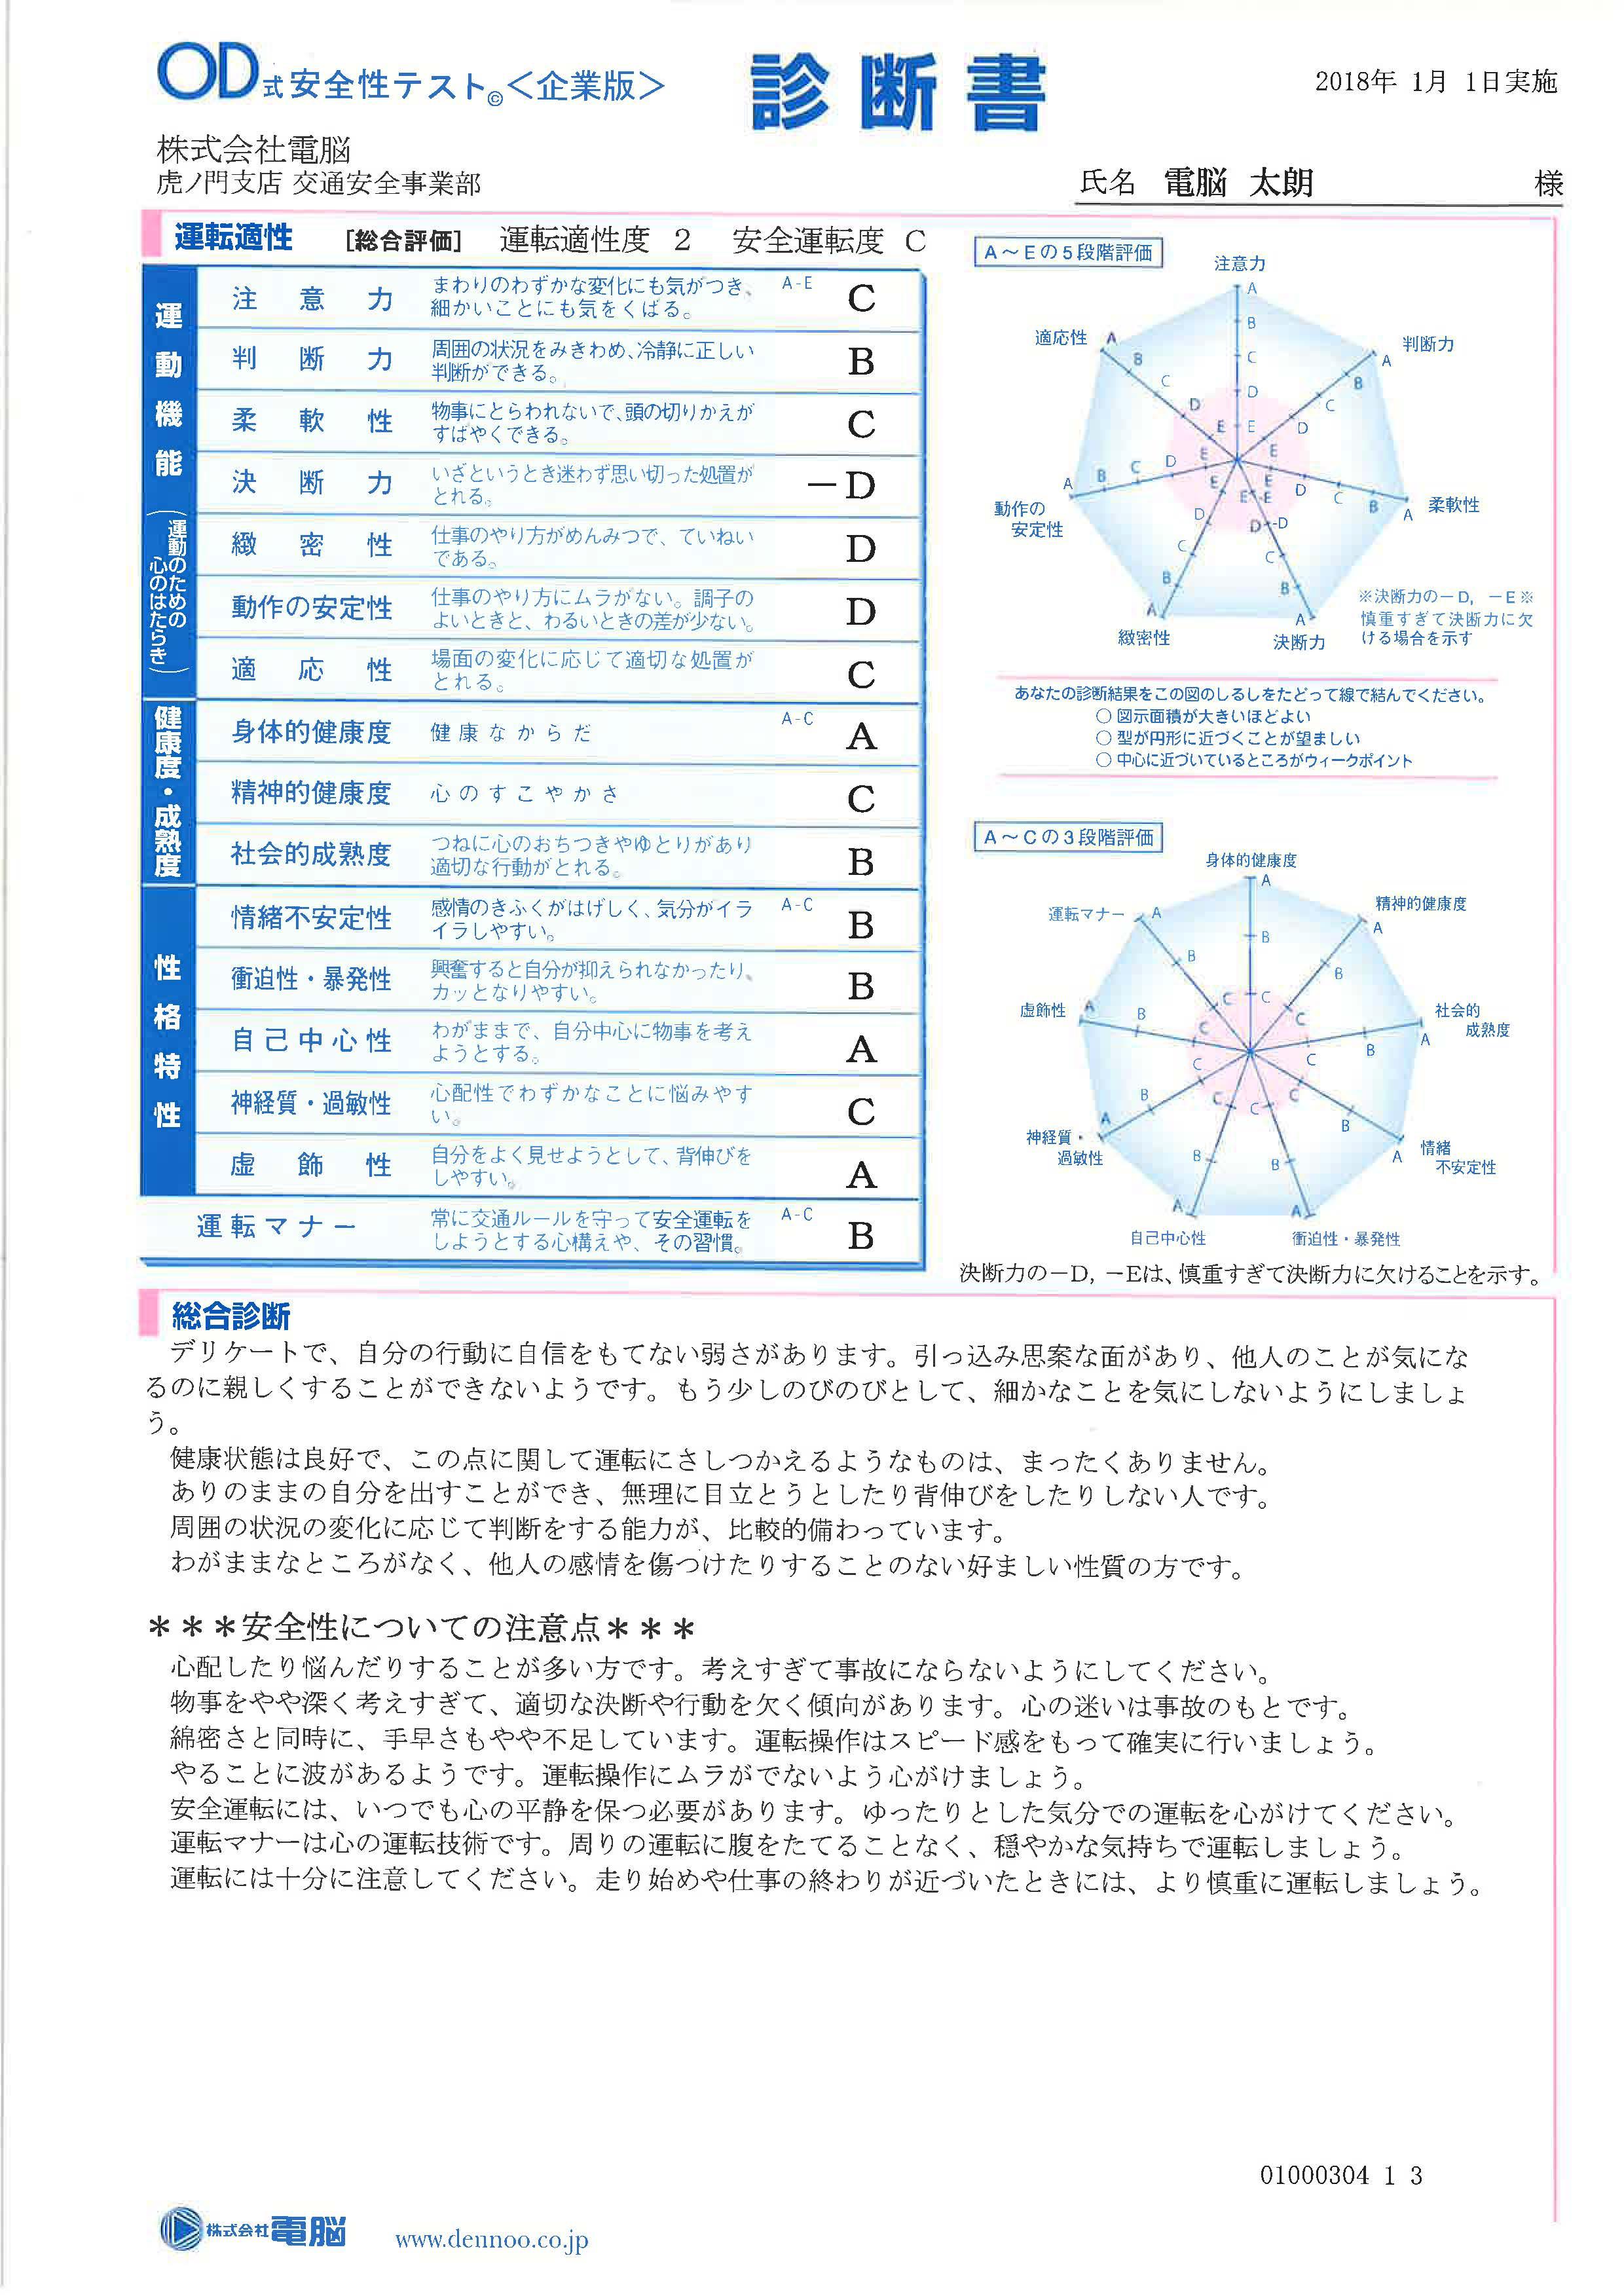 OD式安全性テスト診断書(個人用)